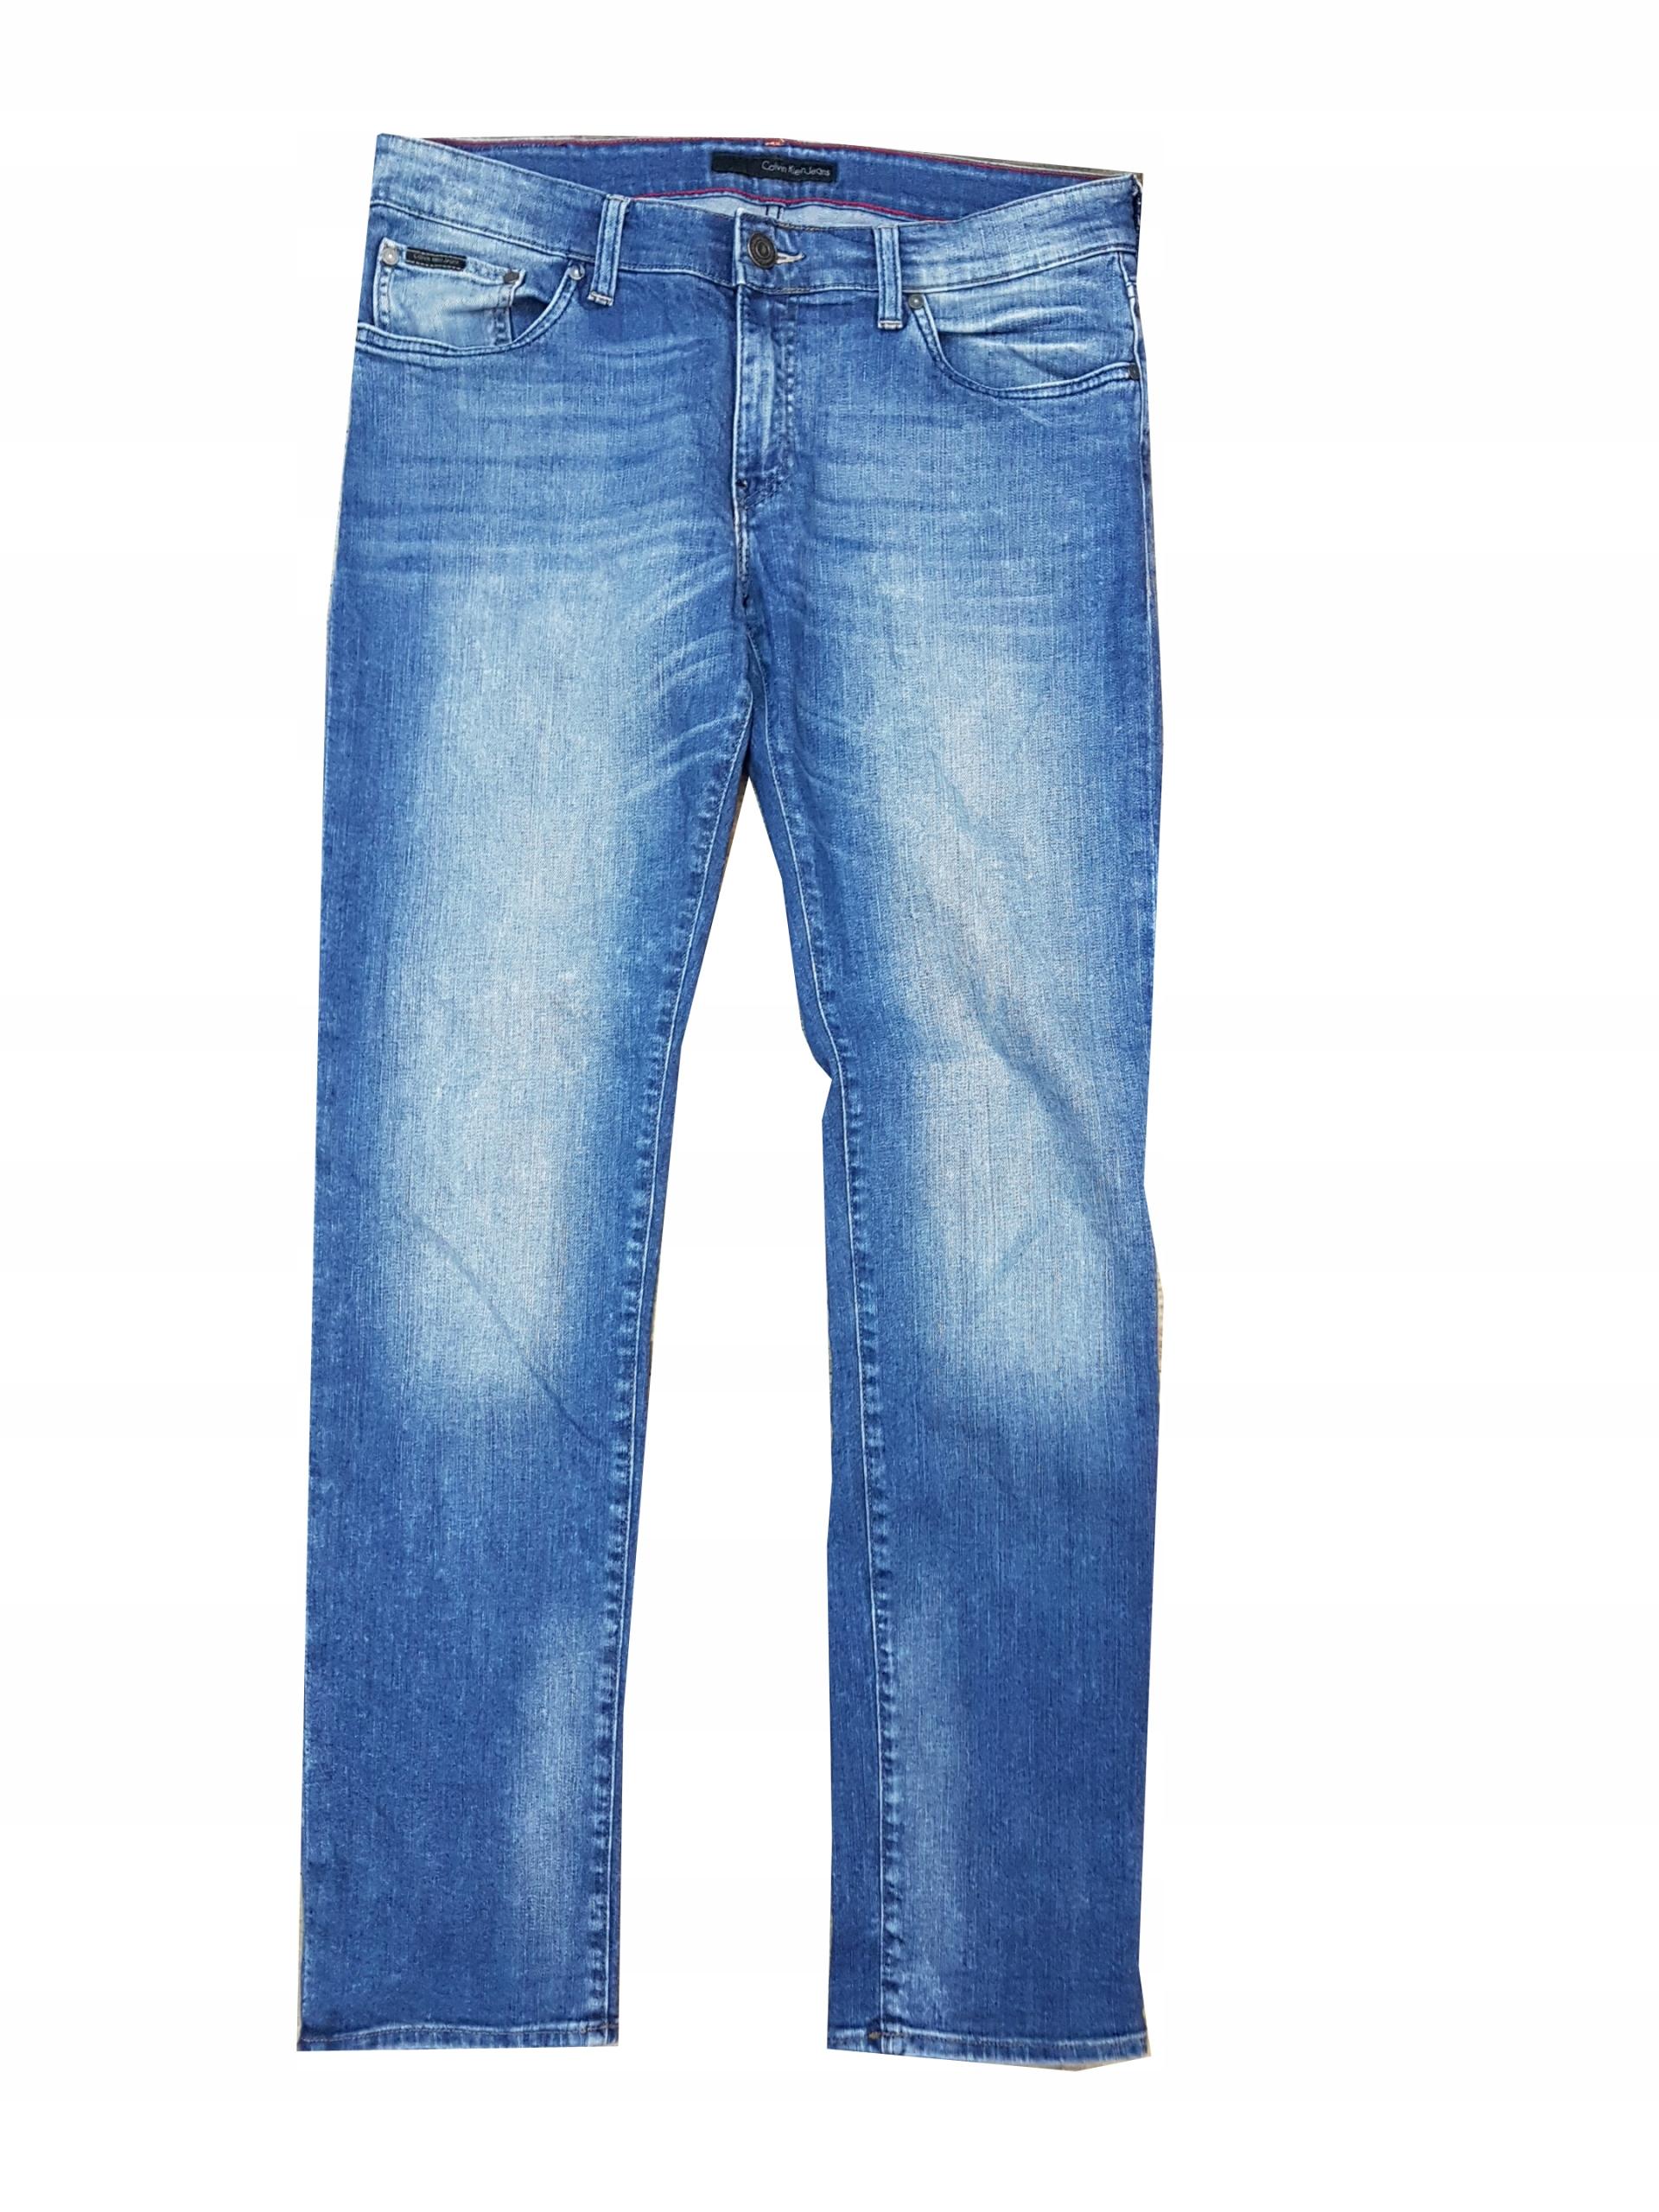 CALVIN KLEIN JEANS Slim jeansy 34/32 pas 90